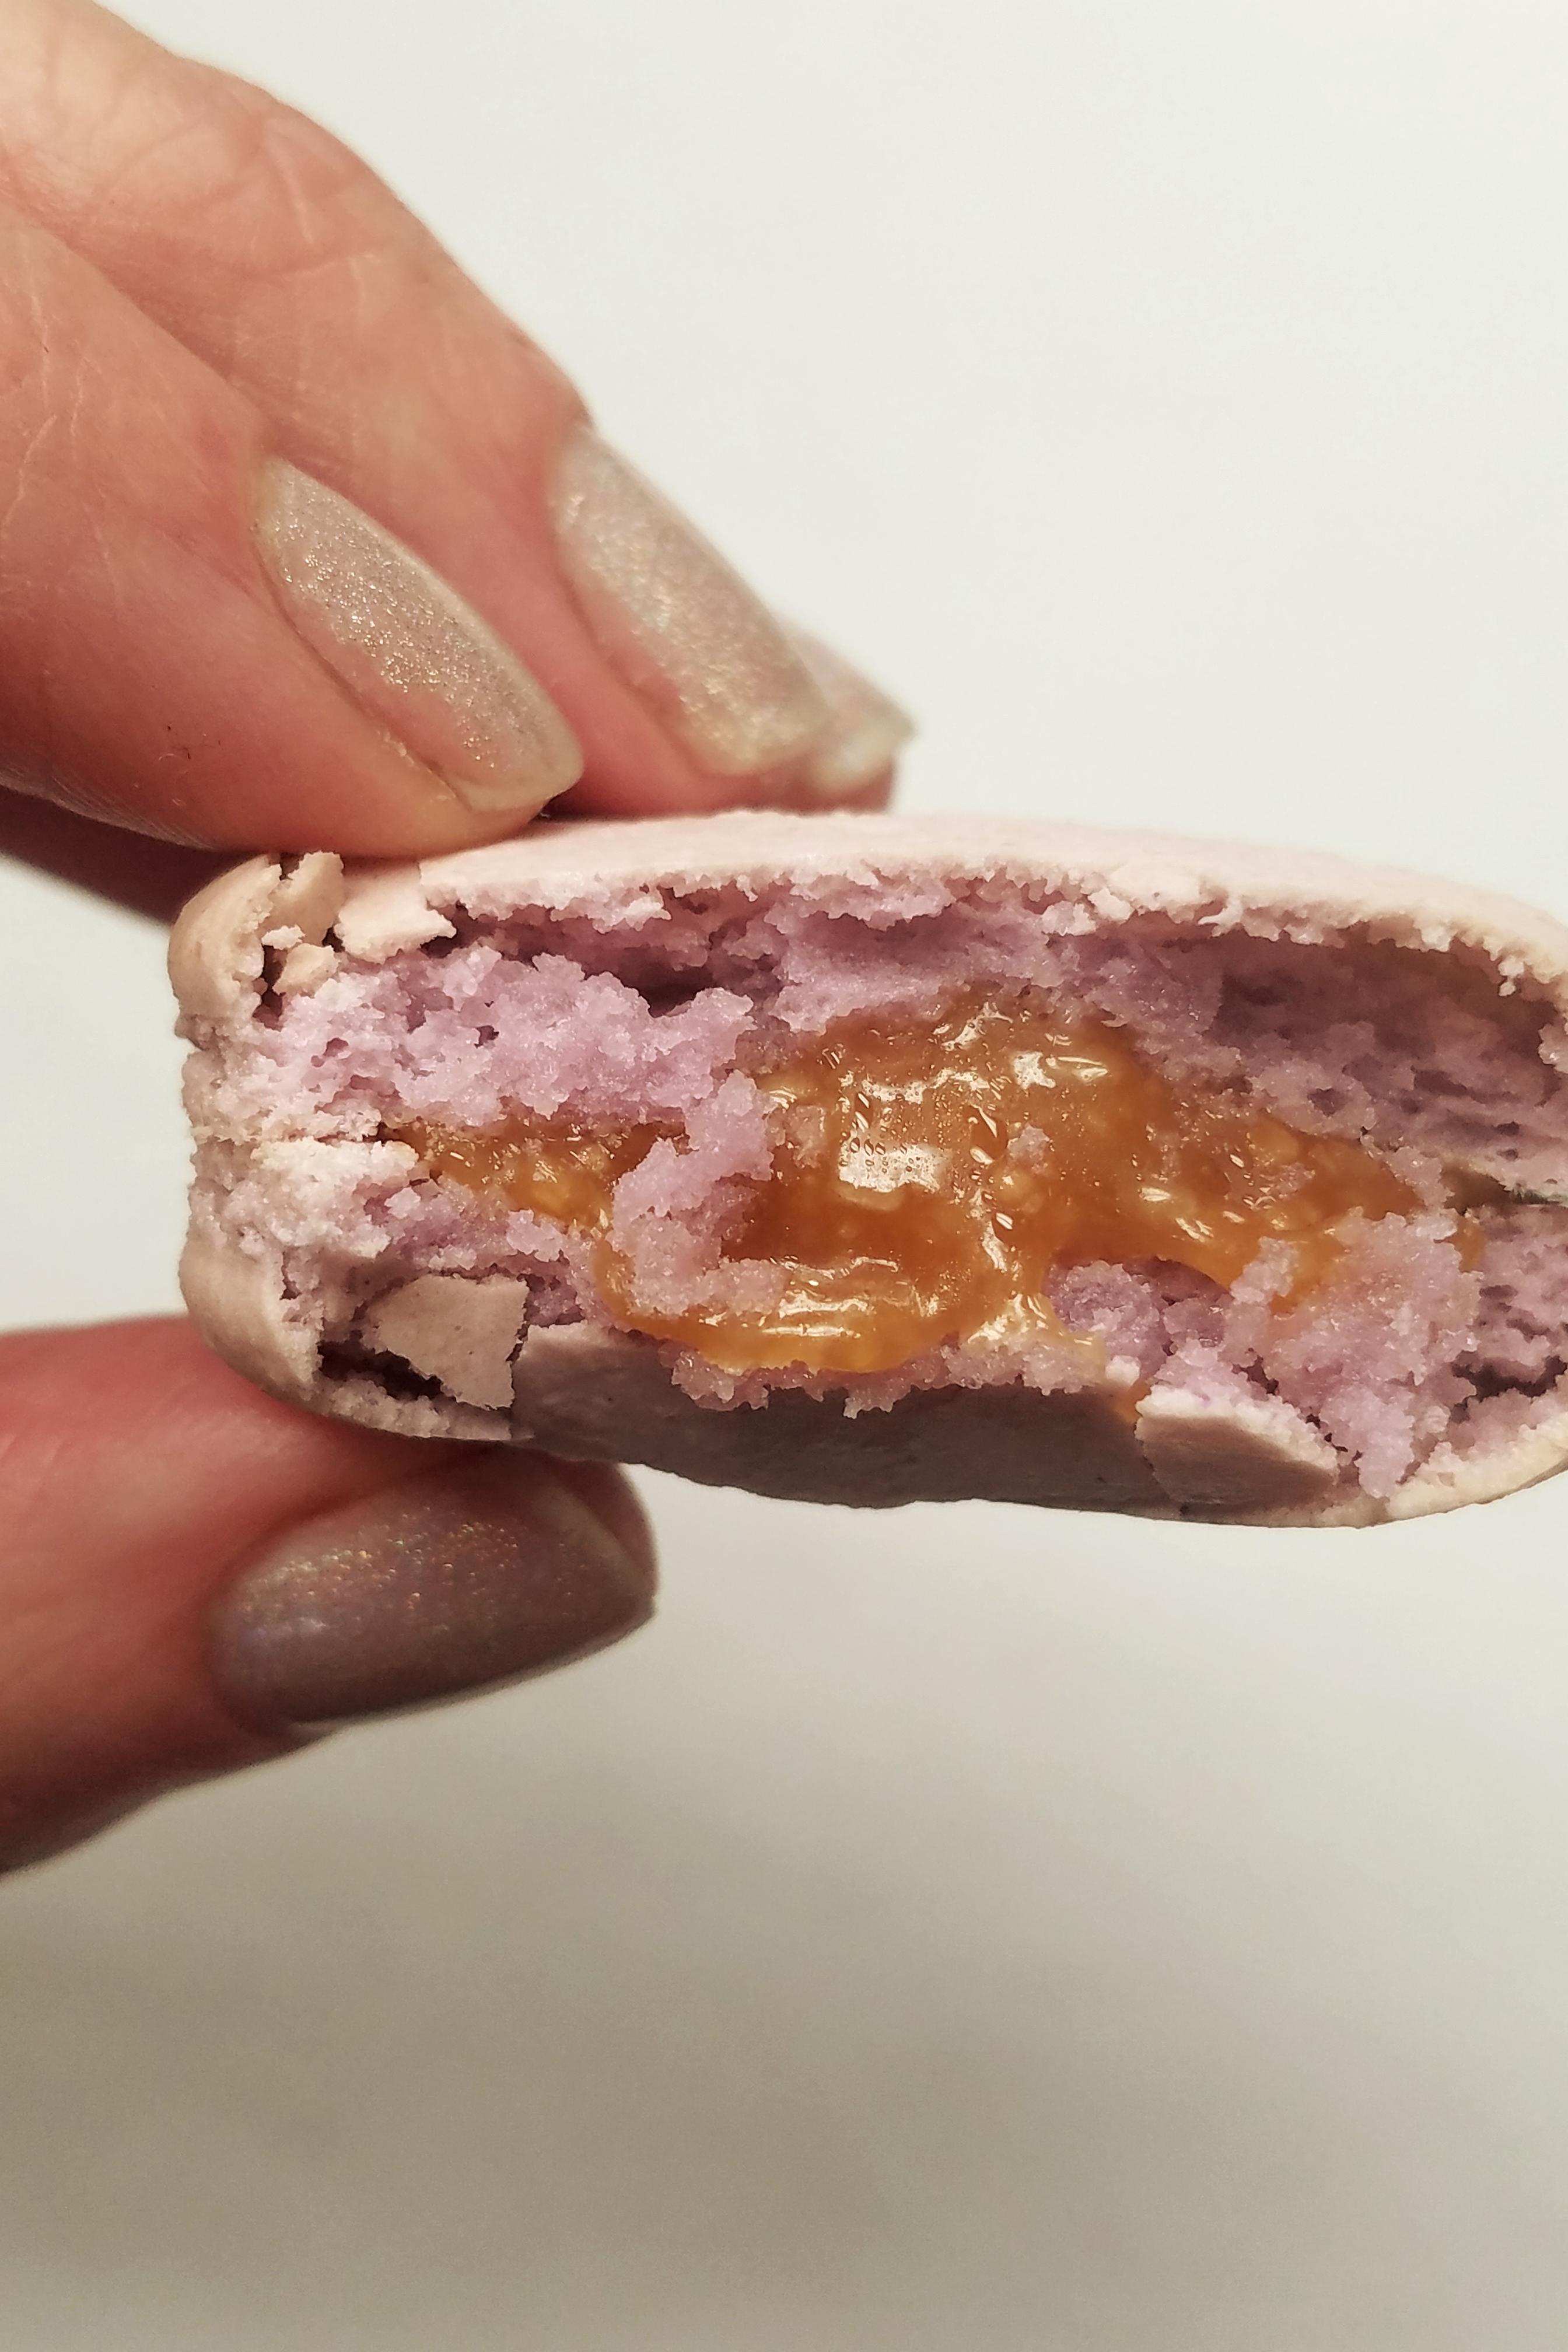 Salted Caramel - YUM